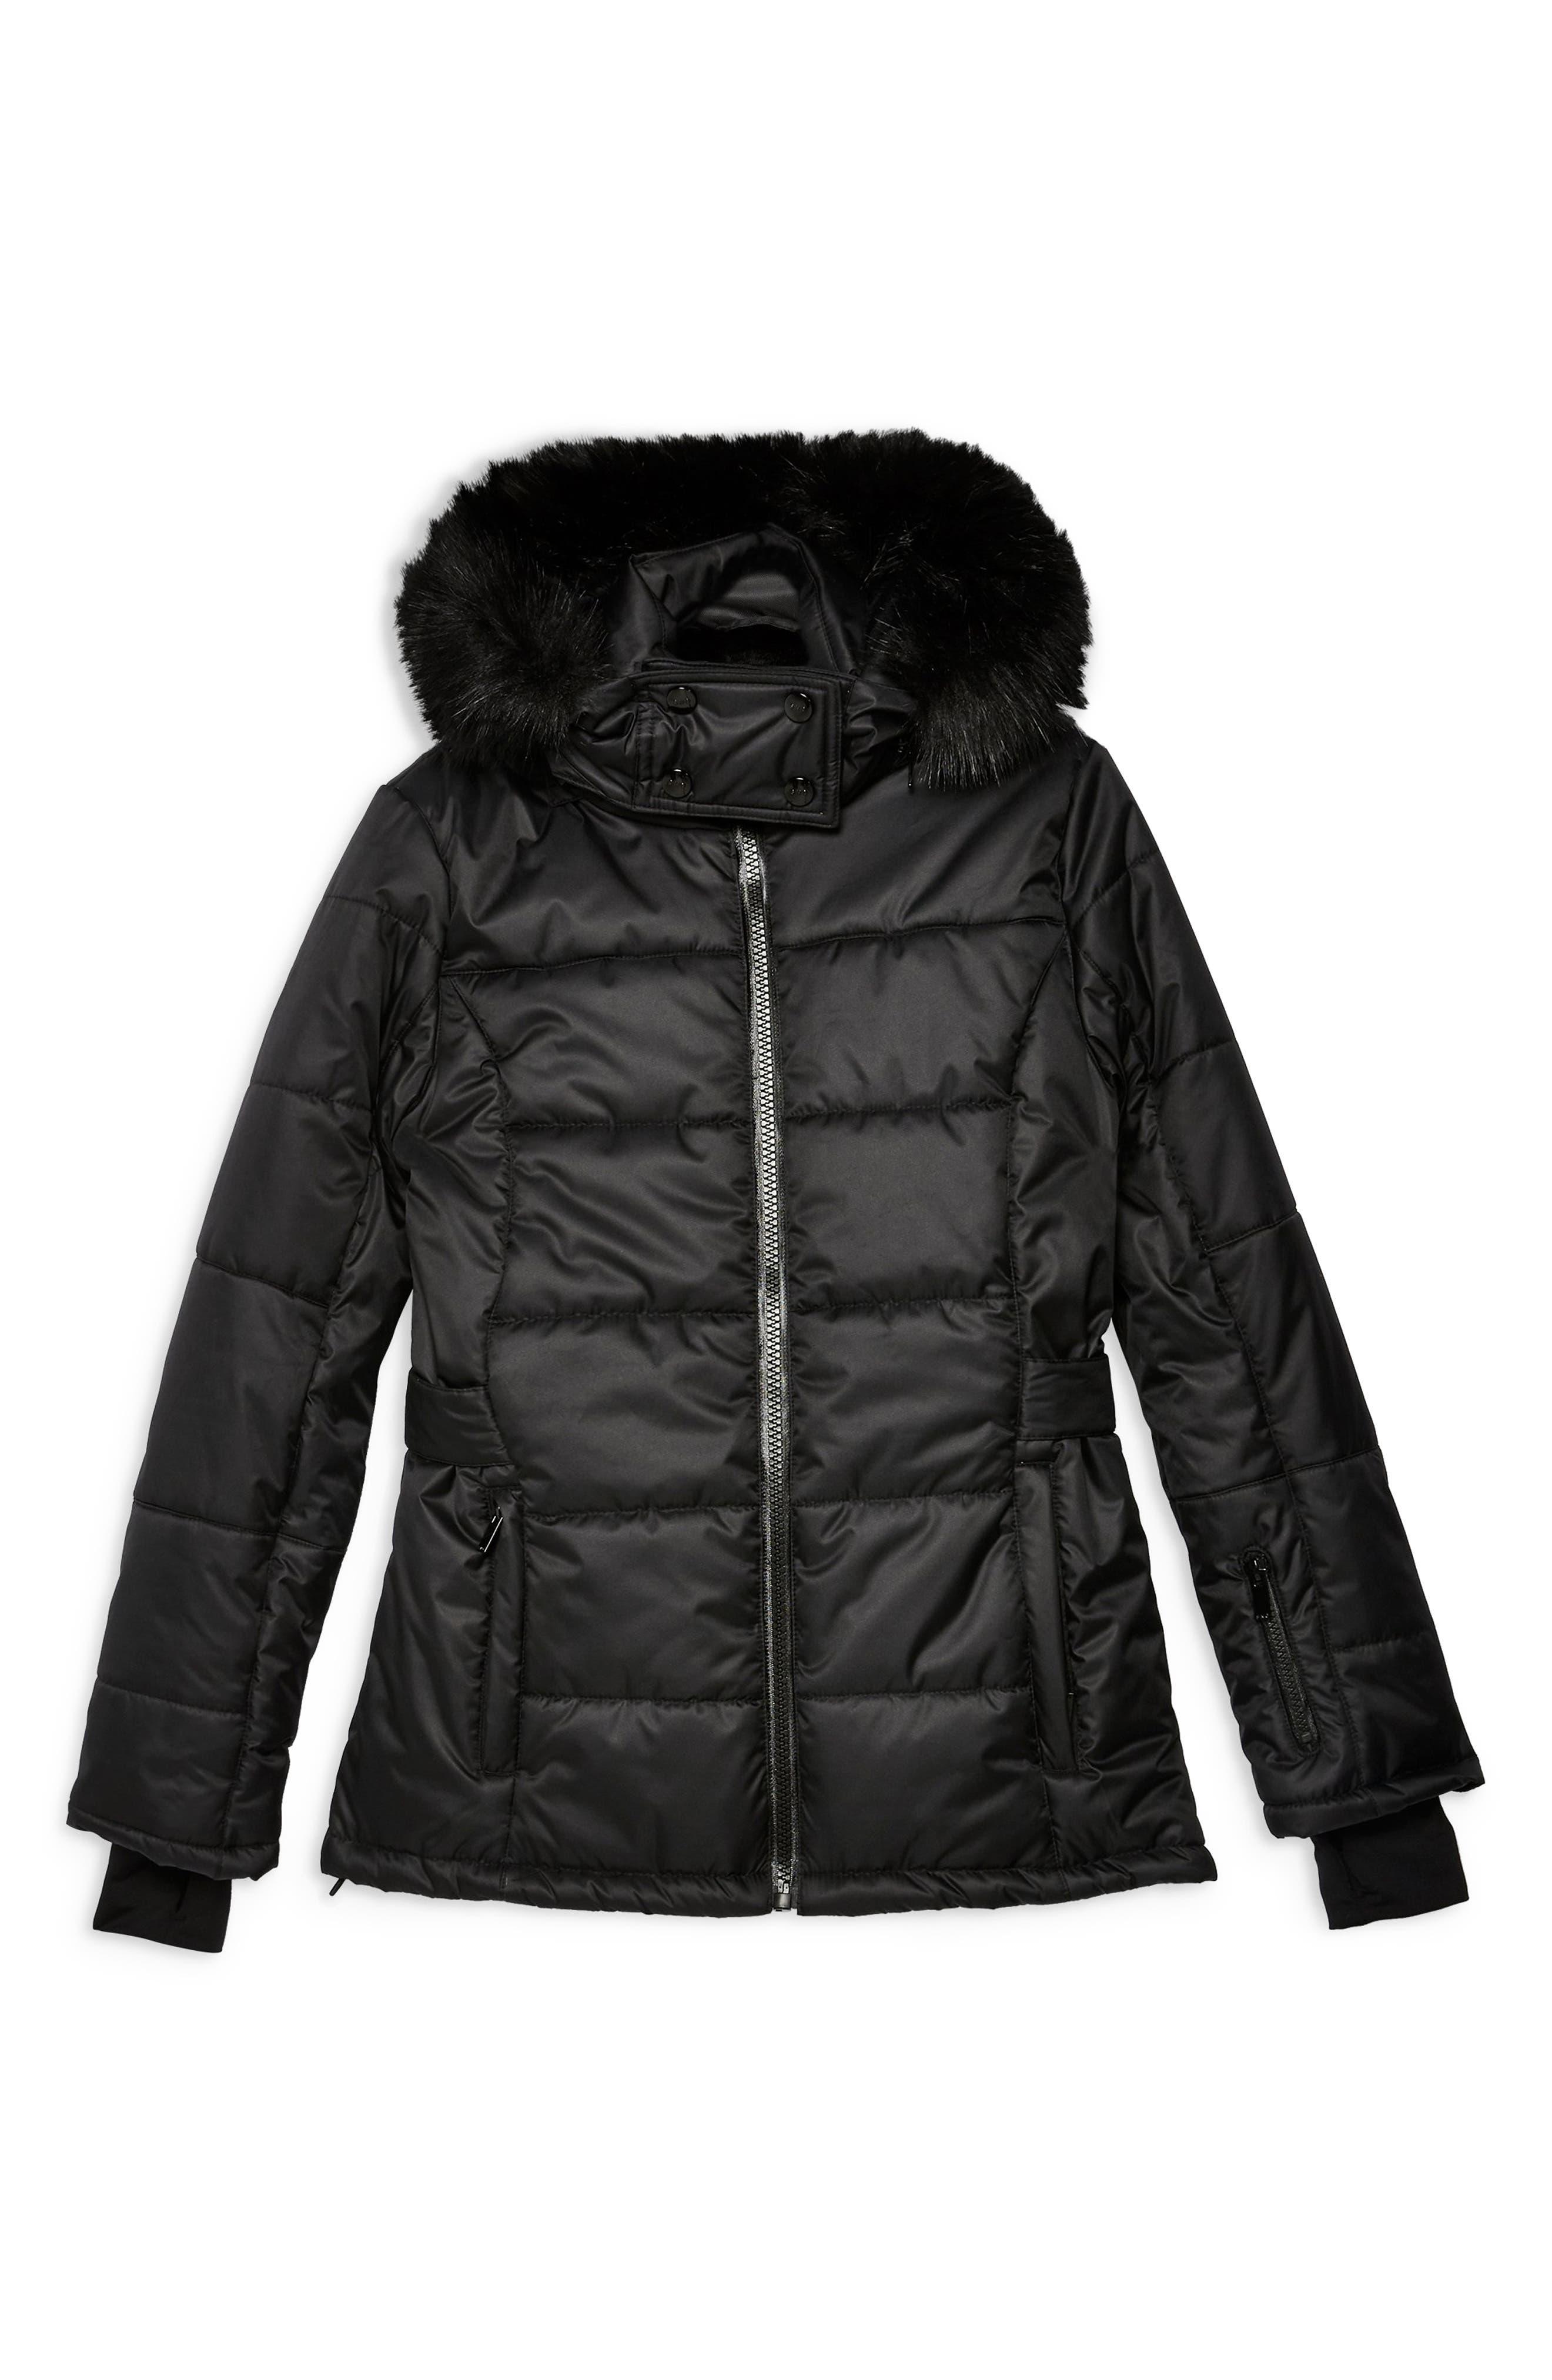 Sno Baby Ski Jacket,                             Alternate thumbnail 4, color,                             BLACK